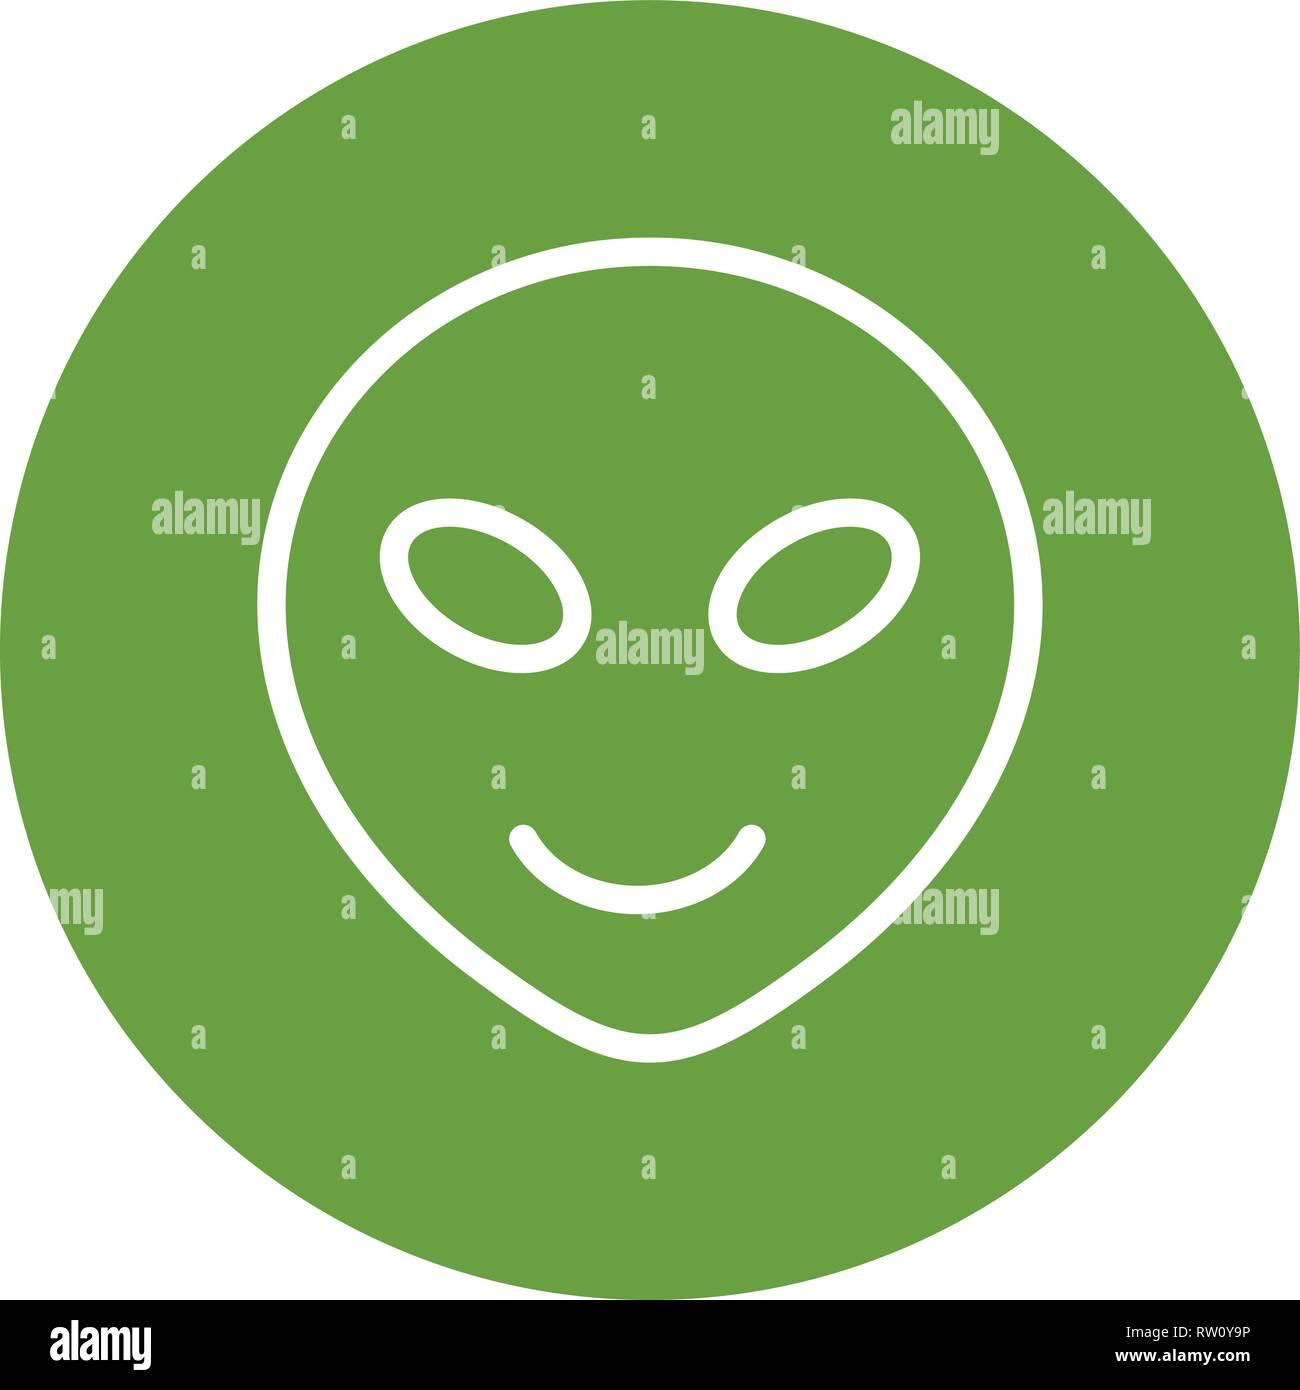 Alien Emoji Vector Icon Sign Icon Vector Illustration For Personal